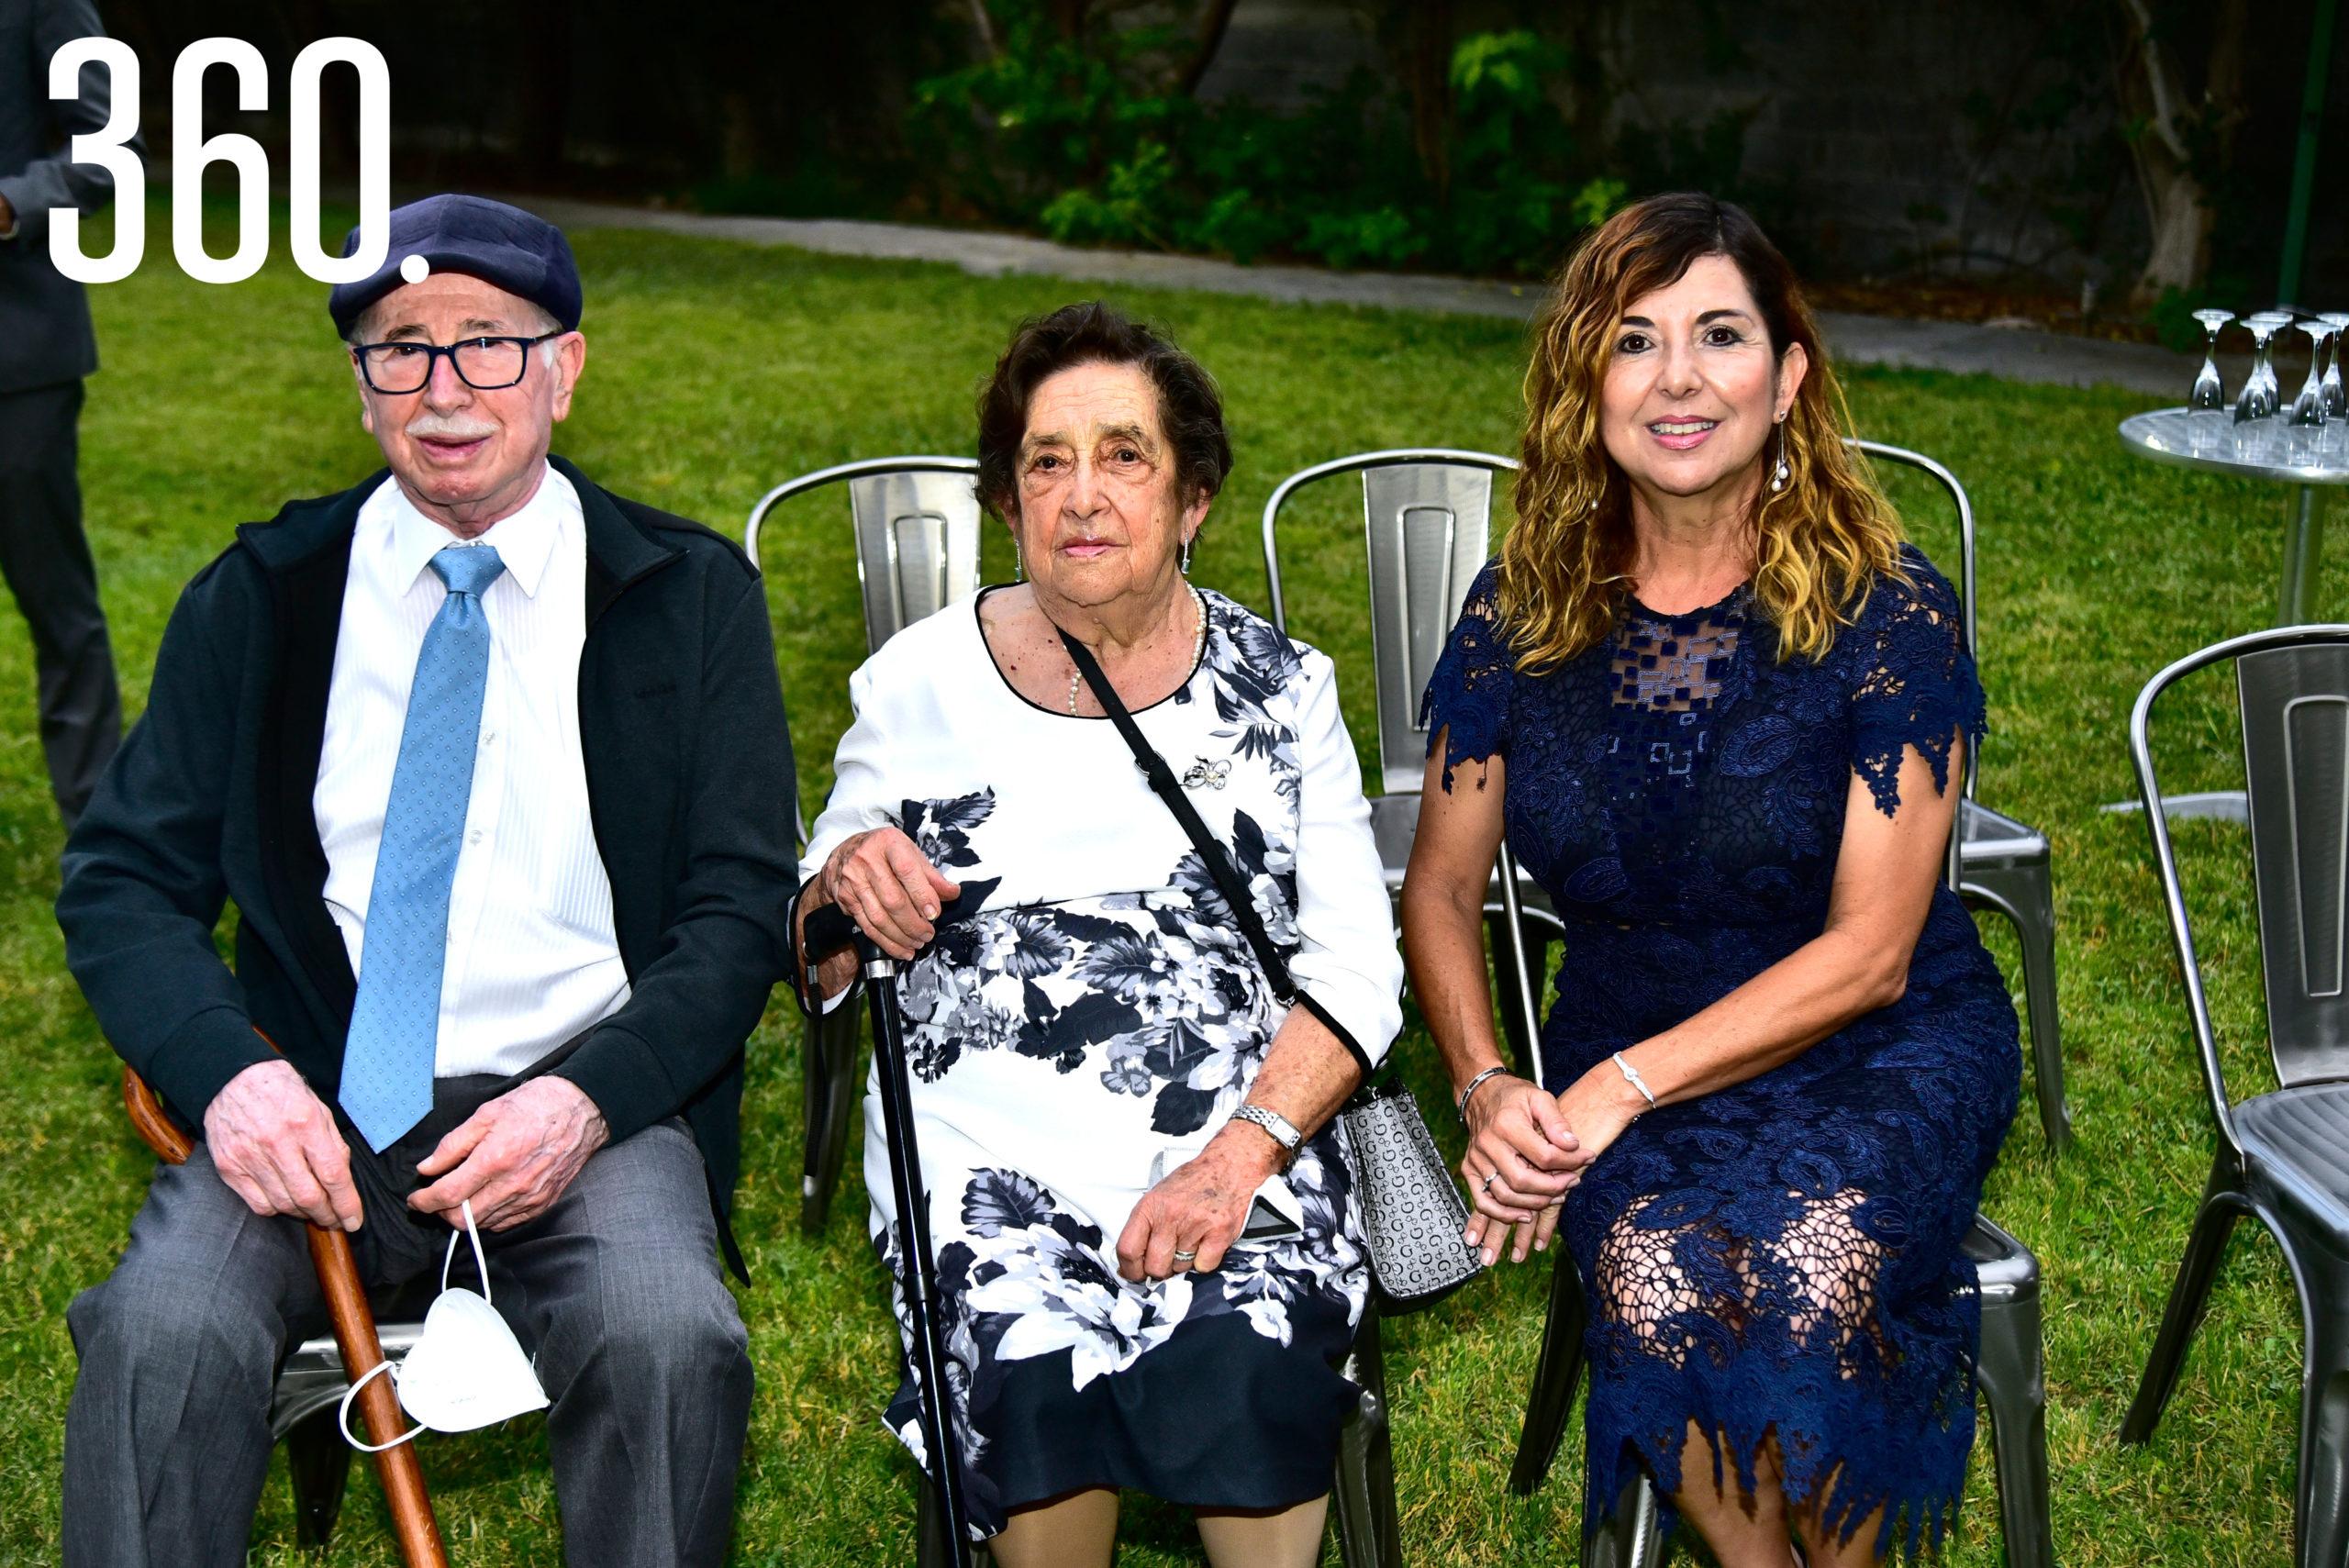 Antonio Saucedo, Angélica Ramos y Lidia Saucedo.